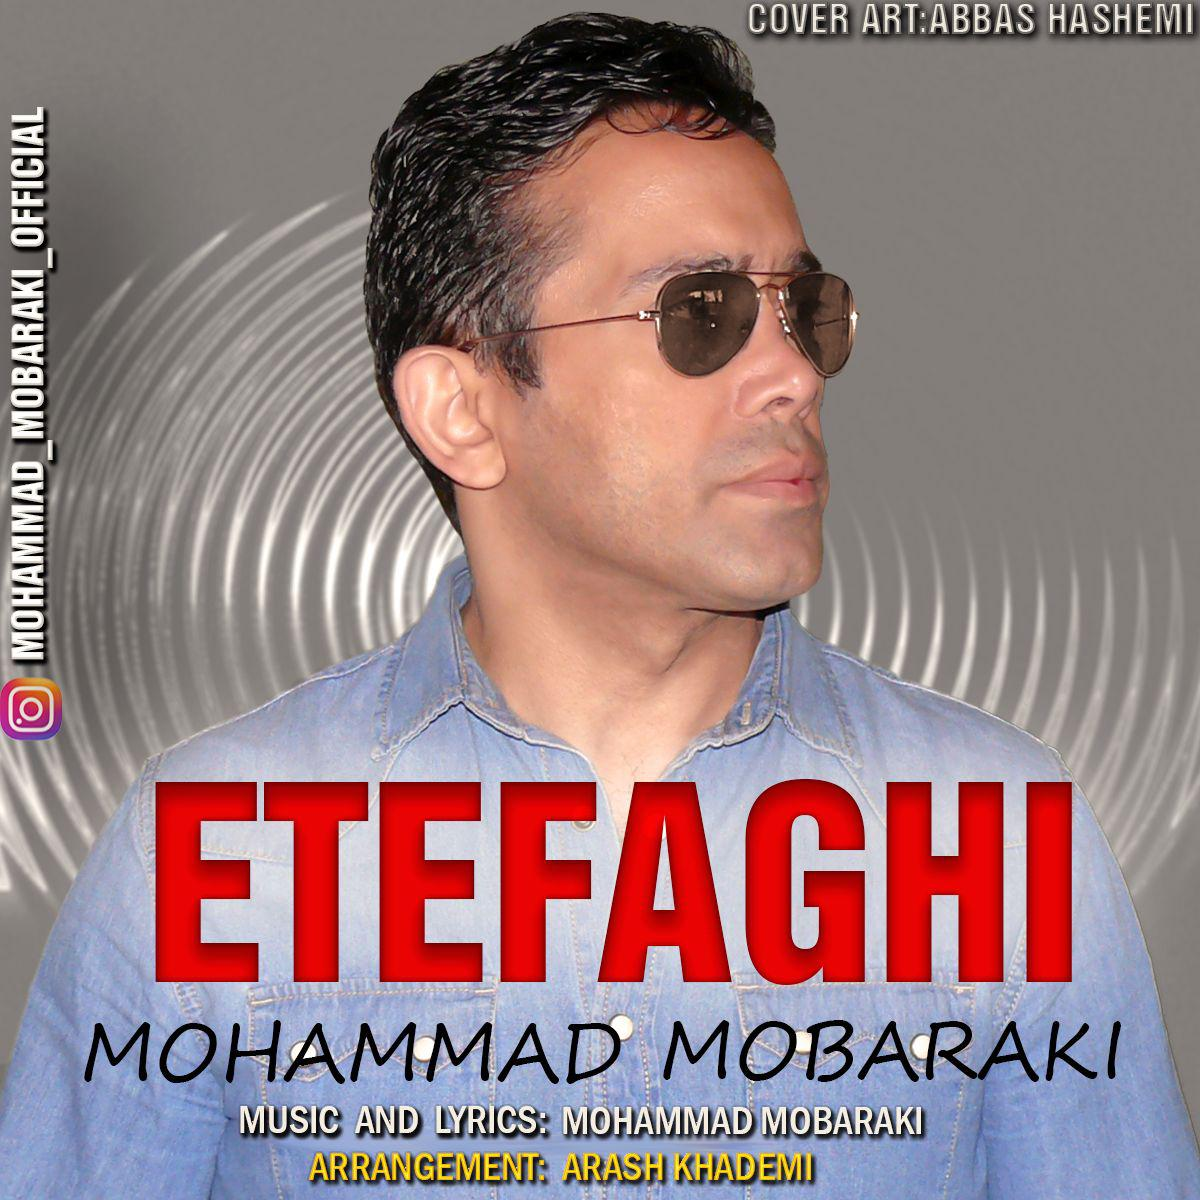 Mohammad Mobaraki – Etefaghi